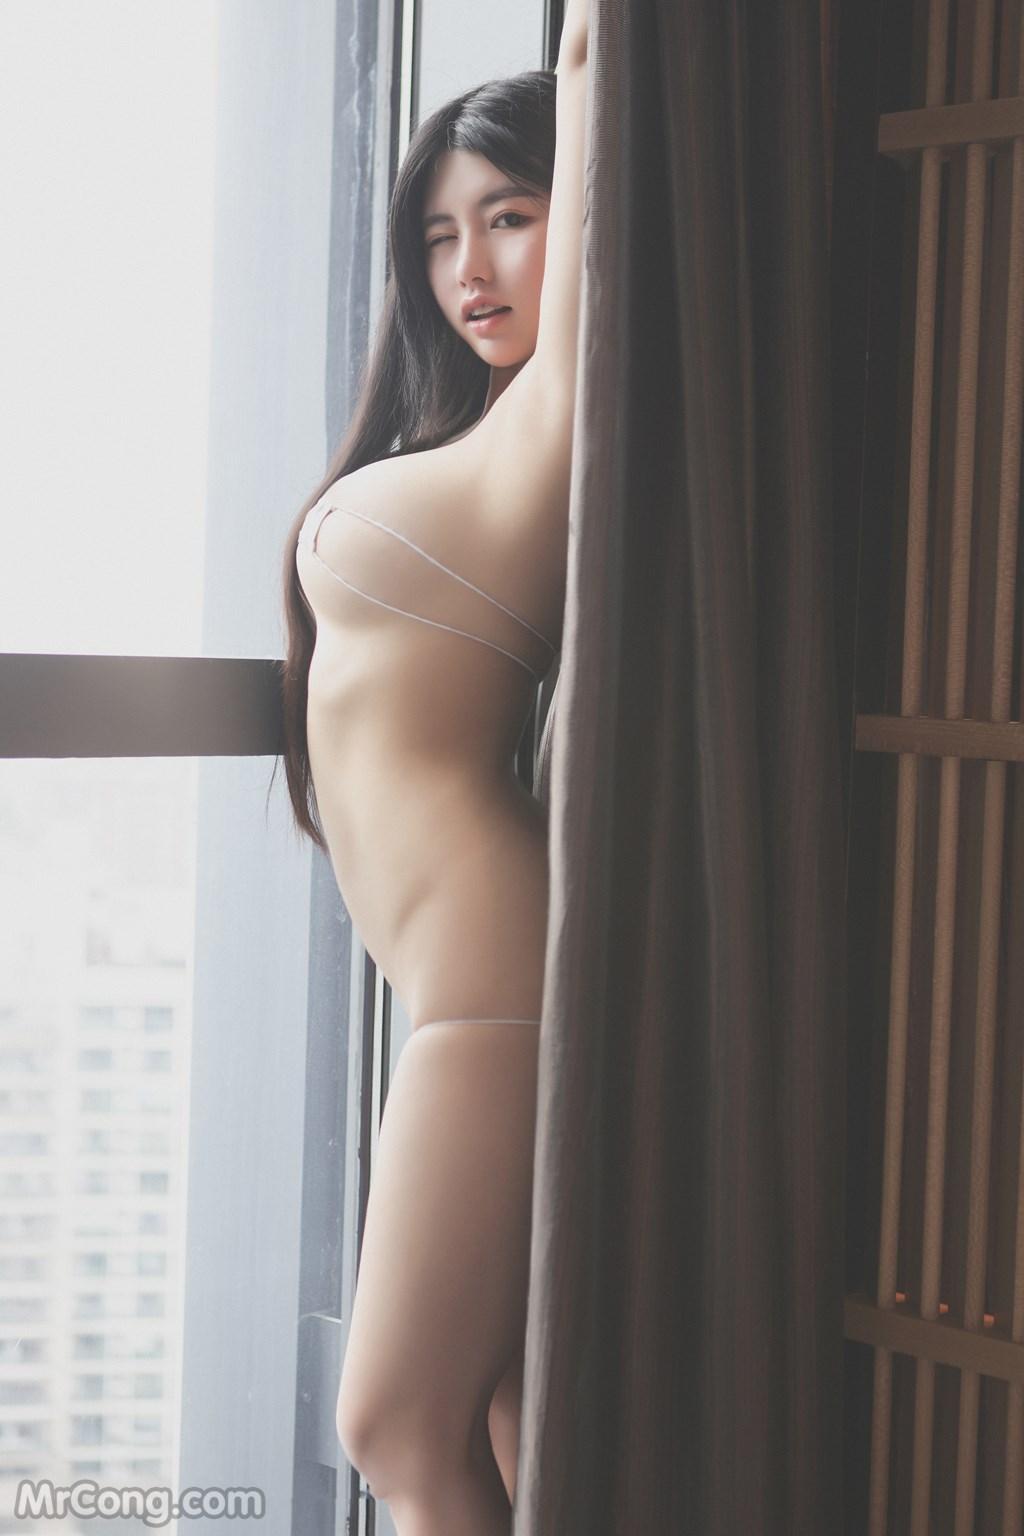 Image BoLoli-2017-06-06-Vol.066-Selena-Na-Lu-MrCong.com-009 in post BoLoli 2017-06-06 Vol.066: Người mẫu Selena (娜露) (35 ảnh)